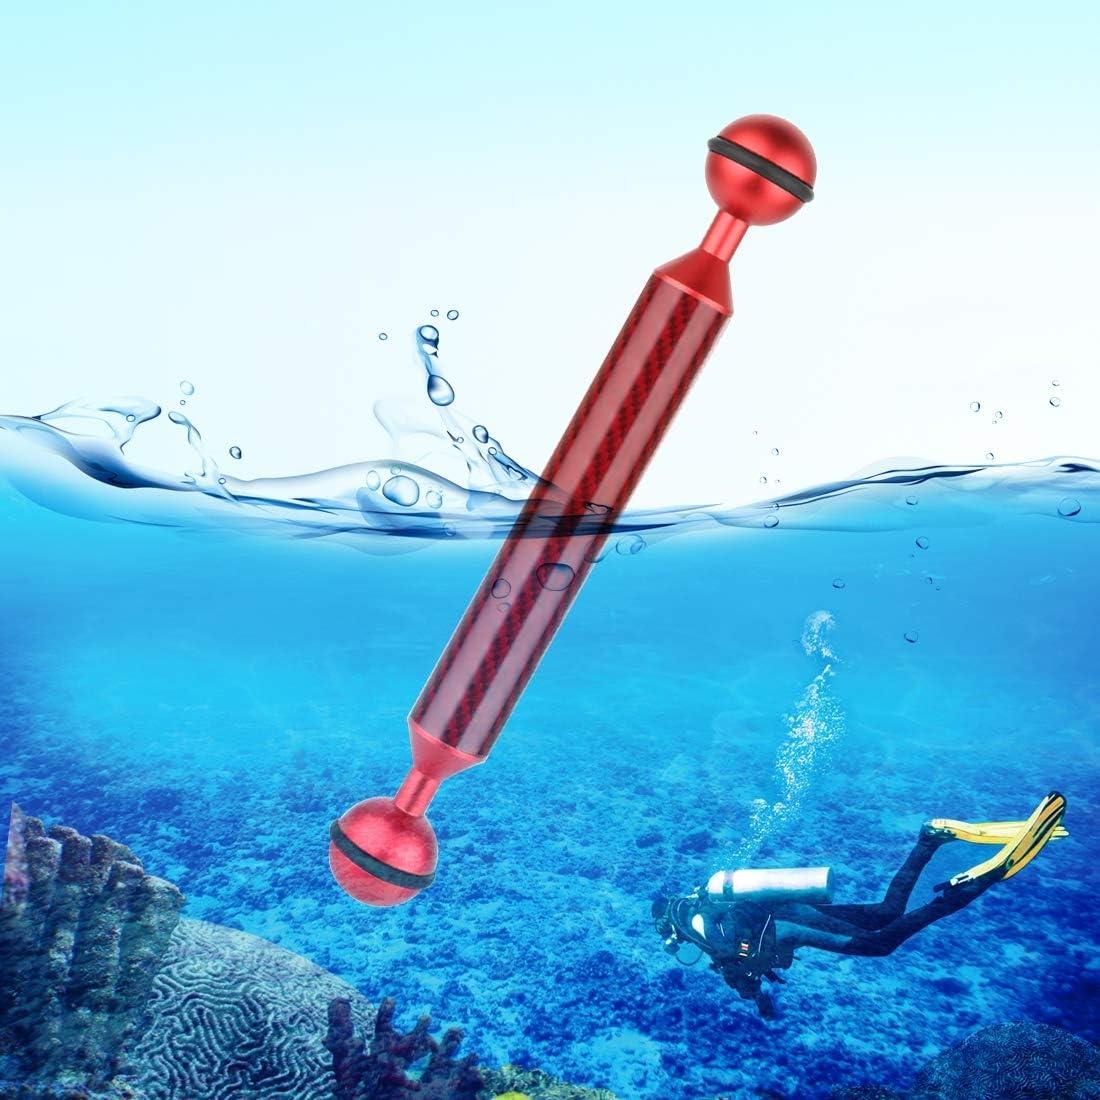 CAOMING 7 inch 17.7cm Length 20.8mm Diameter Dual Balls Carbon Fiber Floating Arm Ball Diameter Color : Blue 25mm Durable